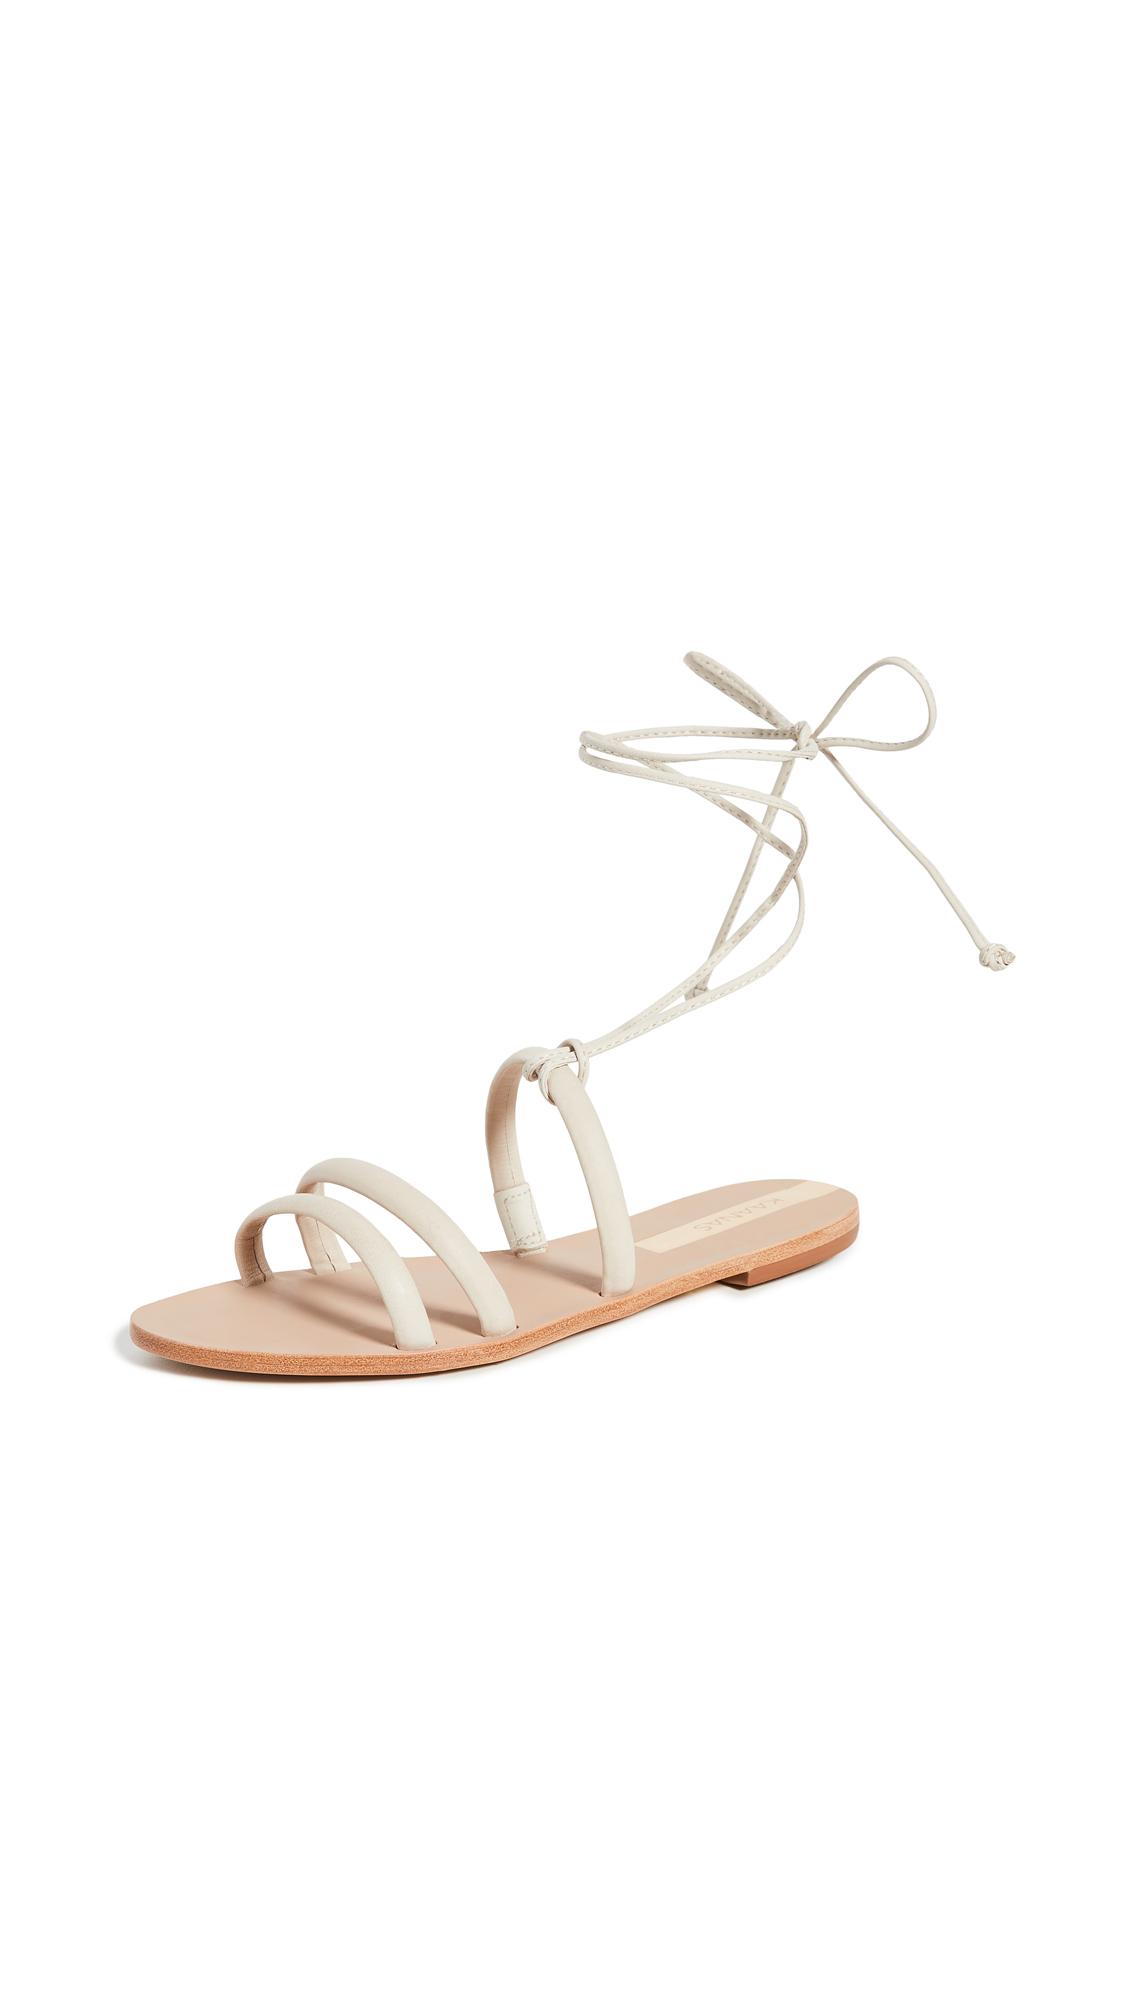 KAANAS Flamengo Sandals – 50% Off Sale